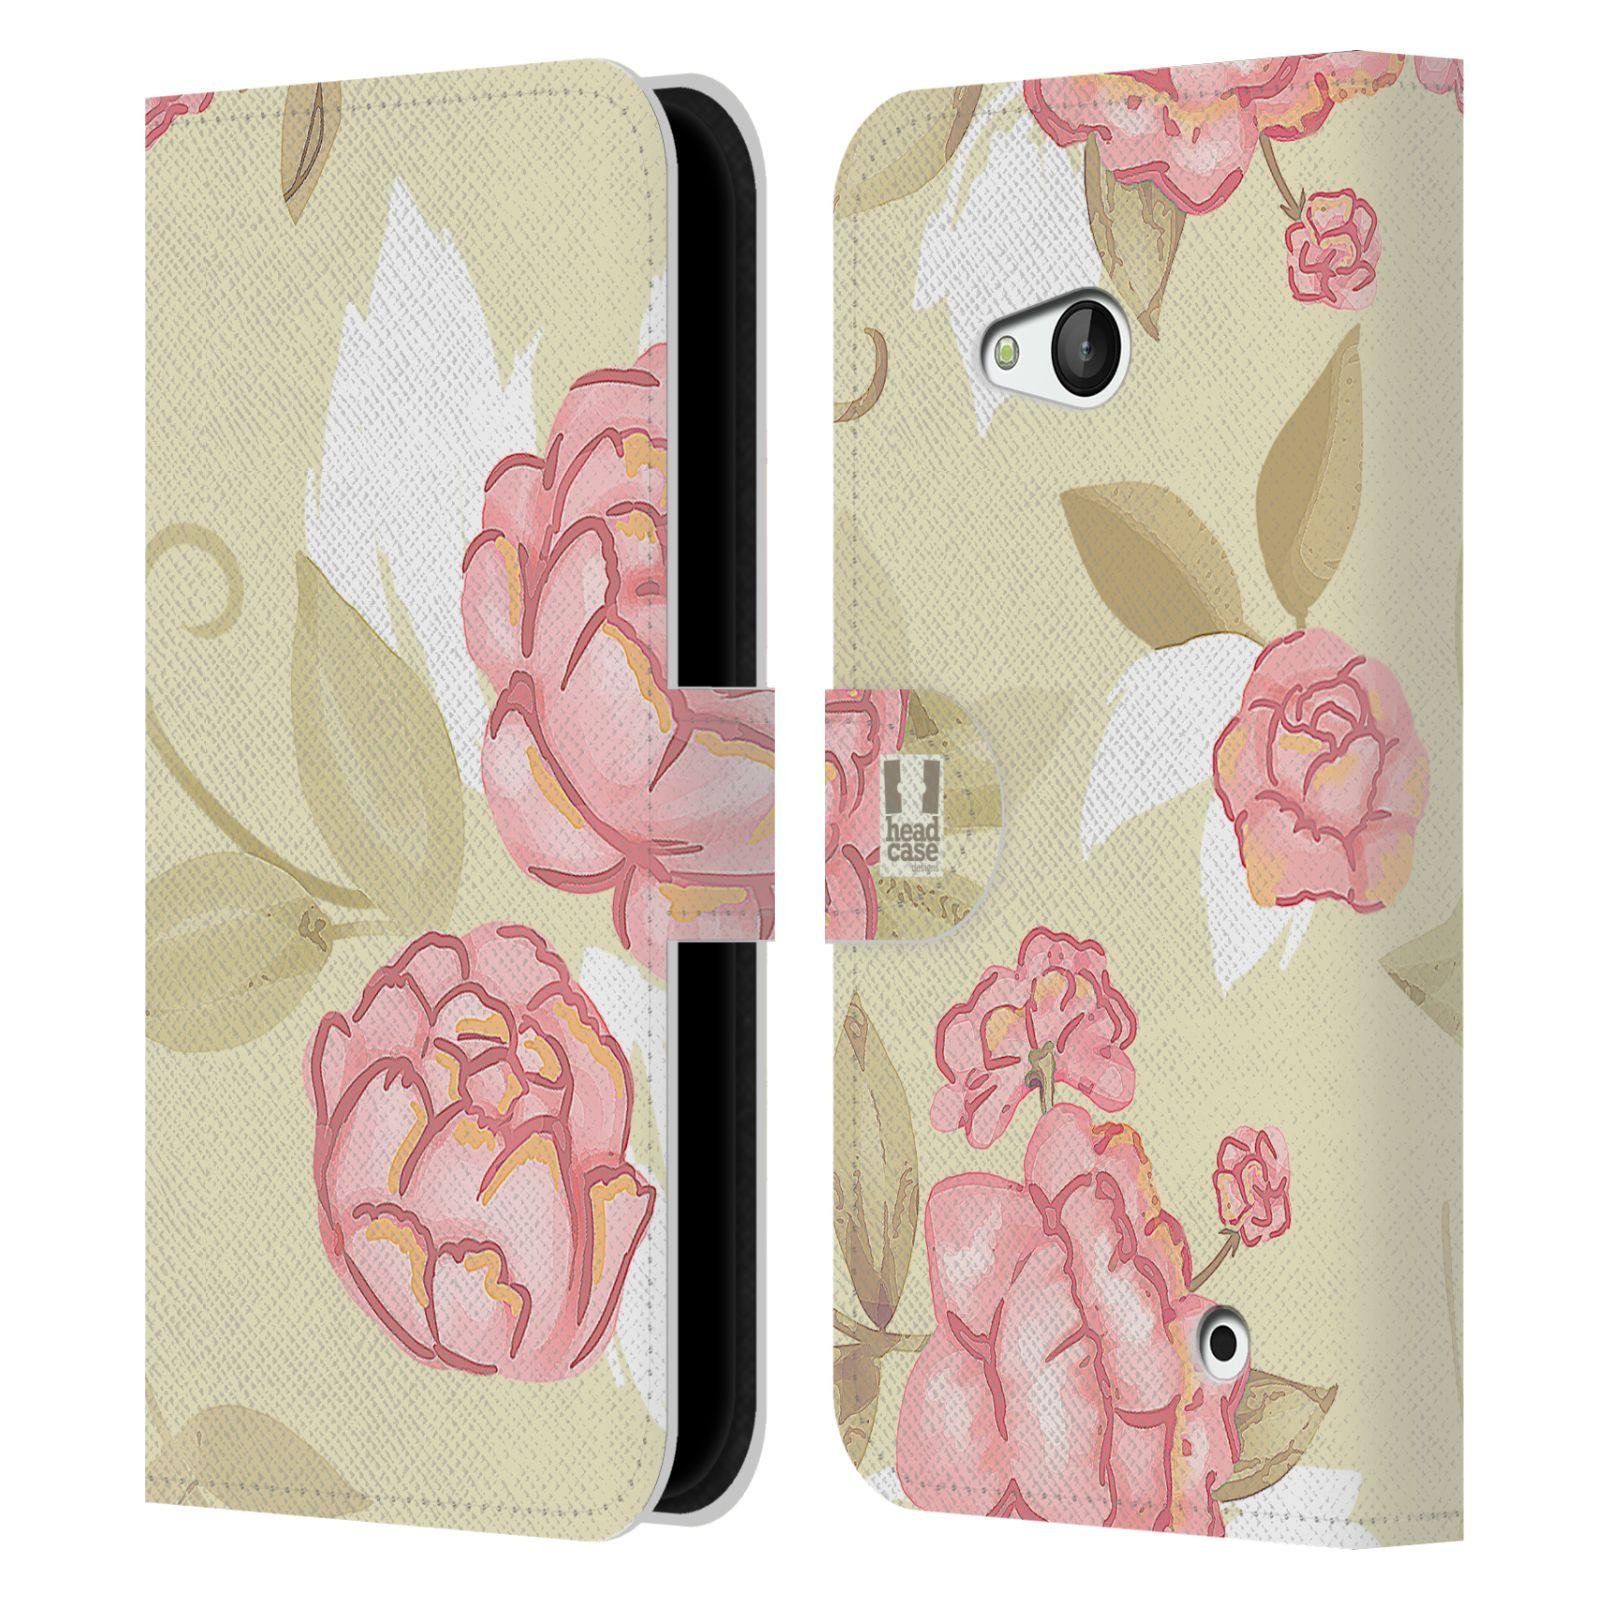 HEAD CASE Flipové pouzdro pro mobil NOKIA / MICROSOFT LUMIA 640 / LUMIA 640 DUAL Francouzský venkov růže VINTAGE